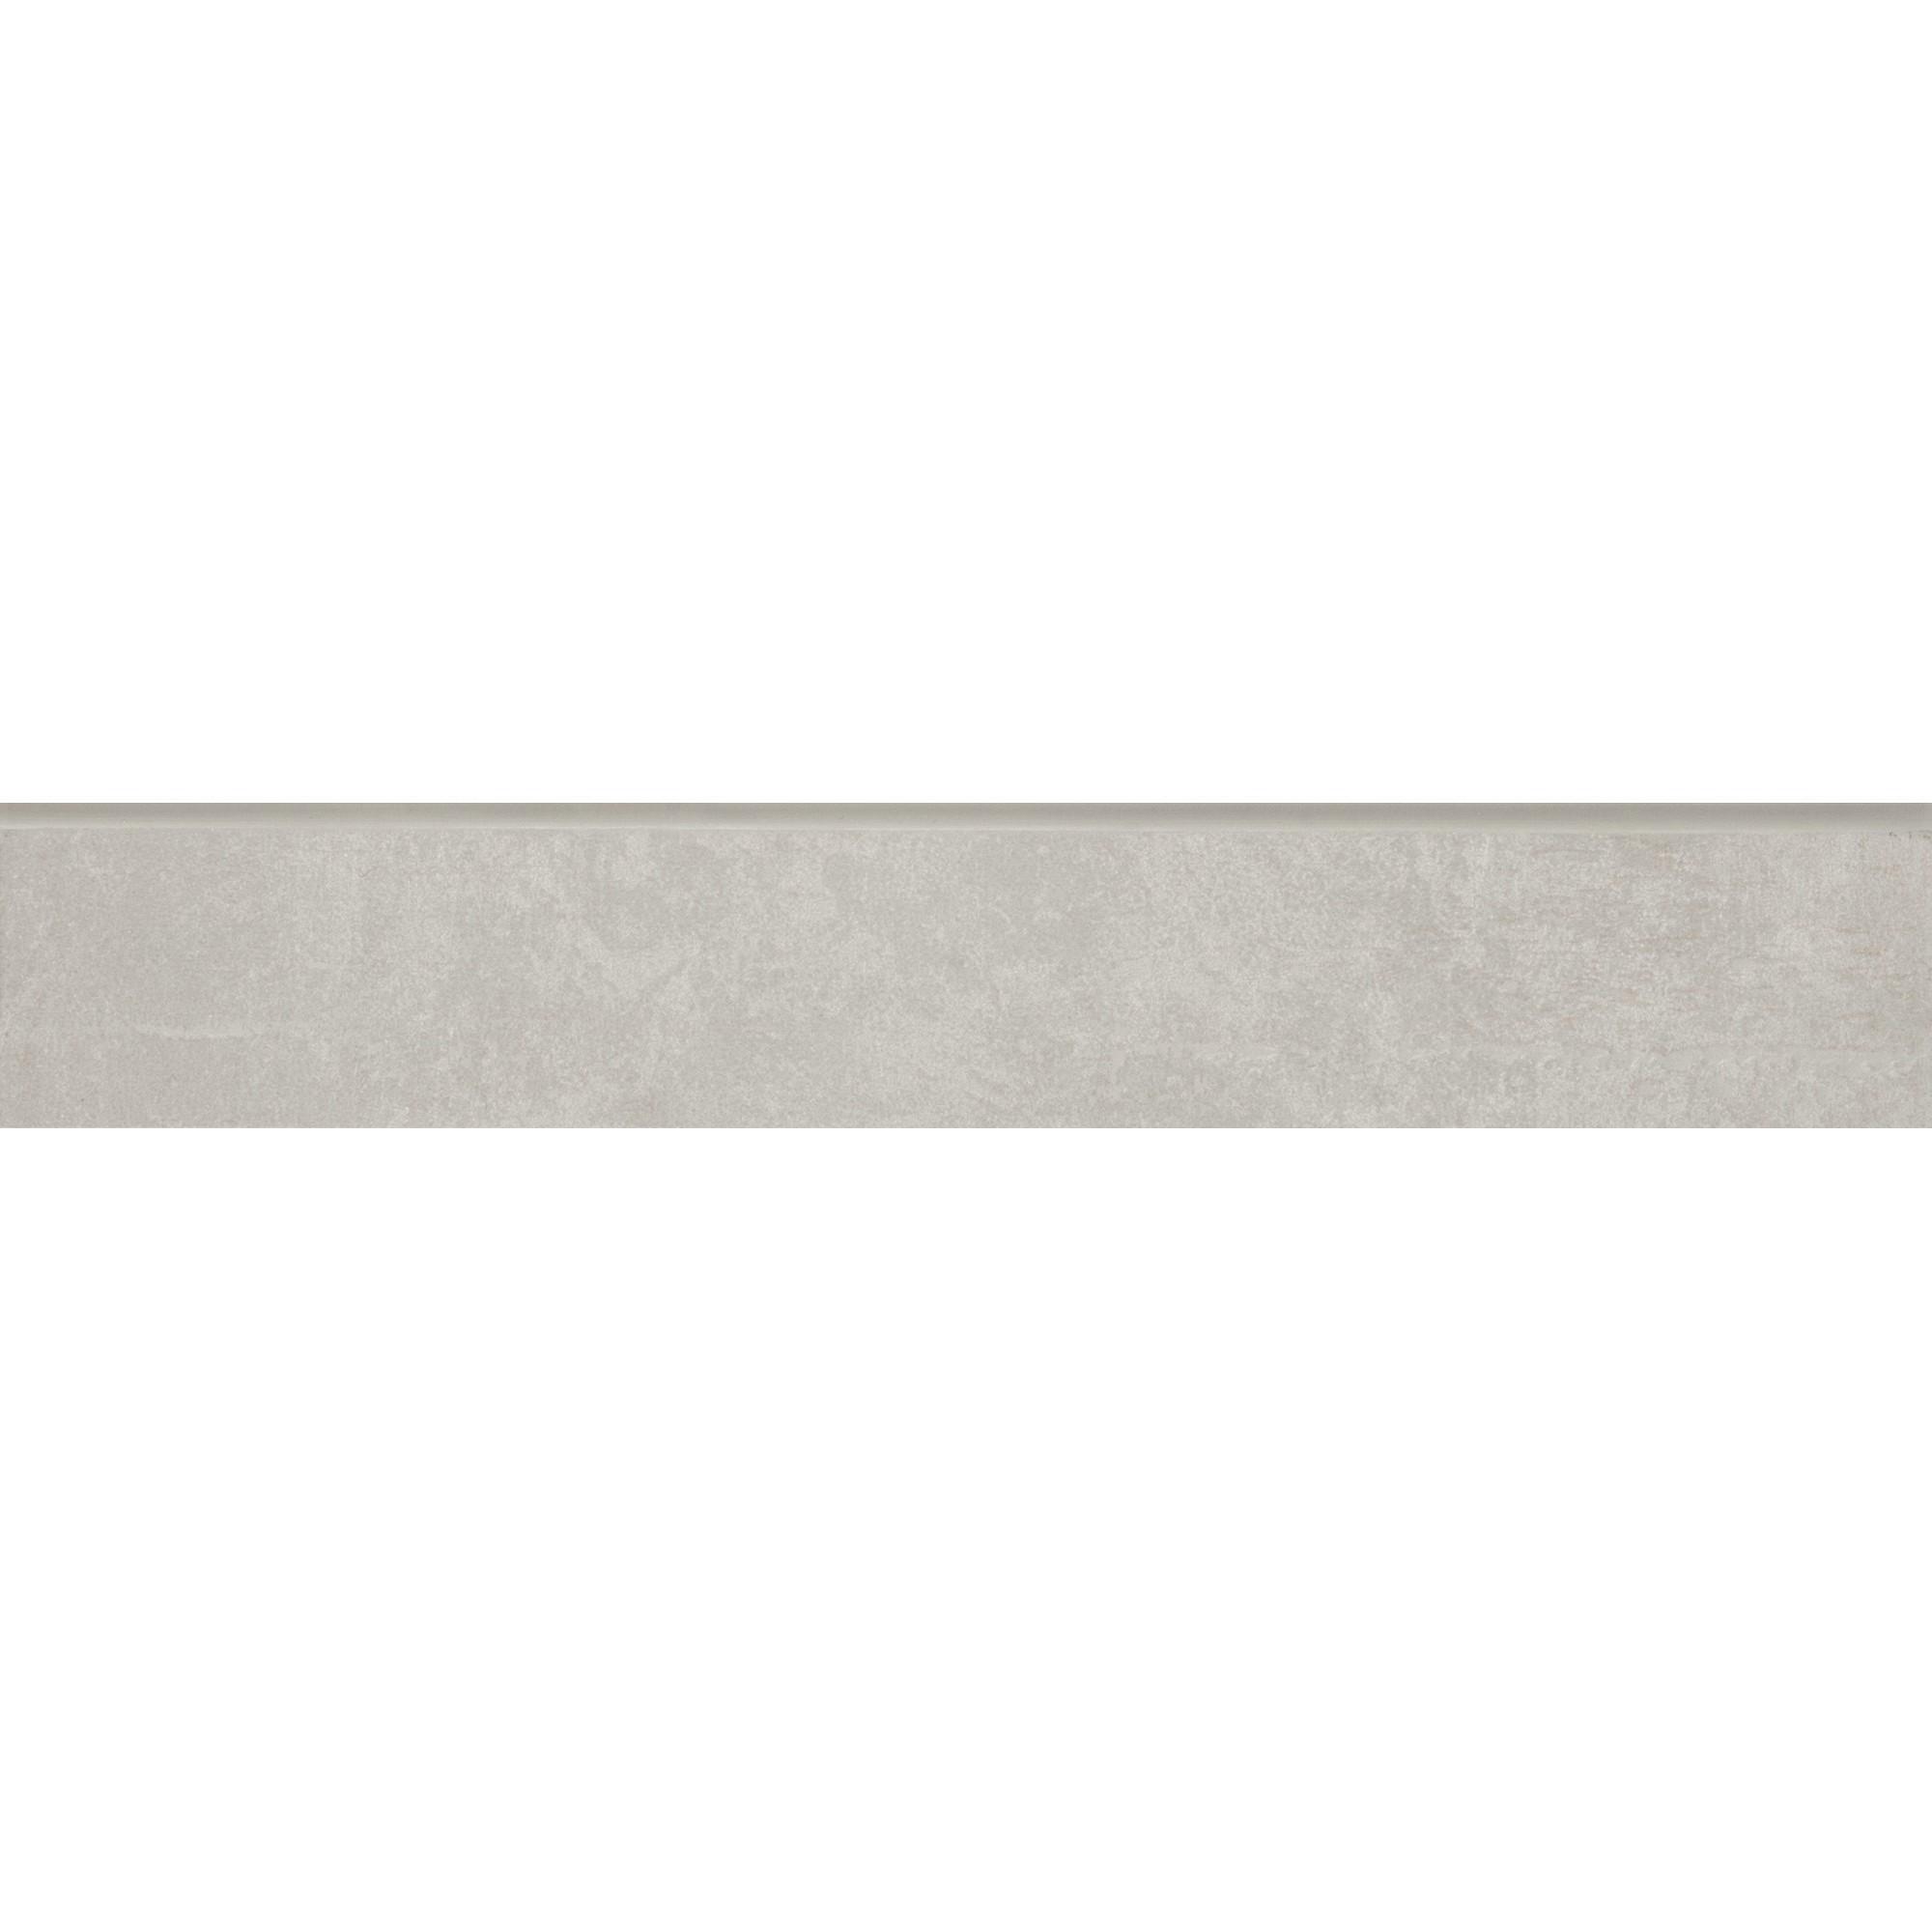 плинтус Grigio (zlxf8318) изображение 0